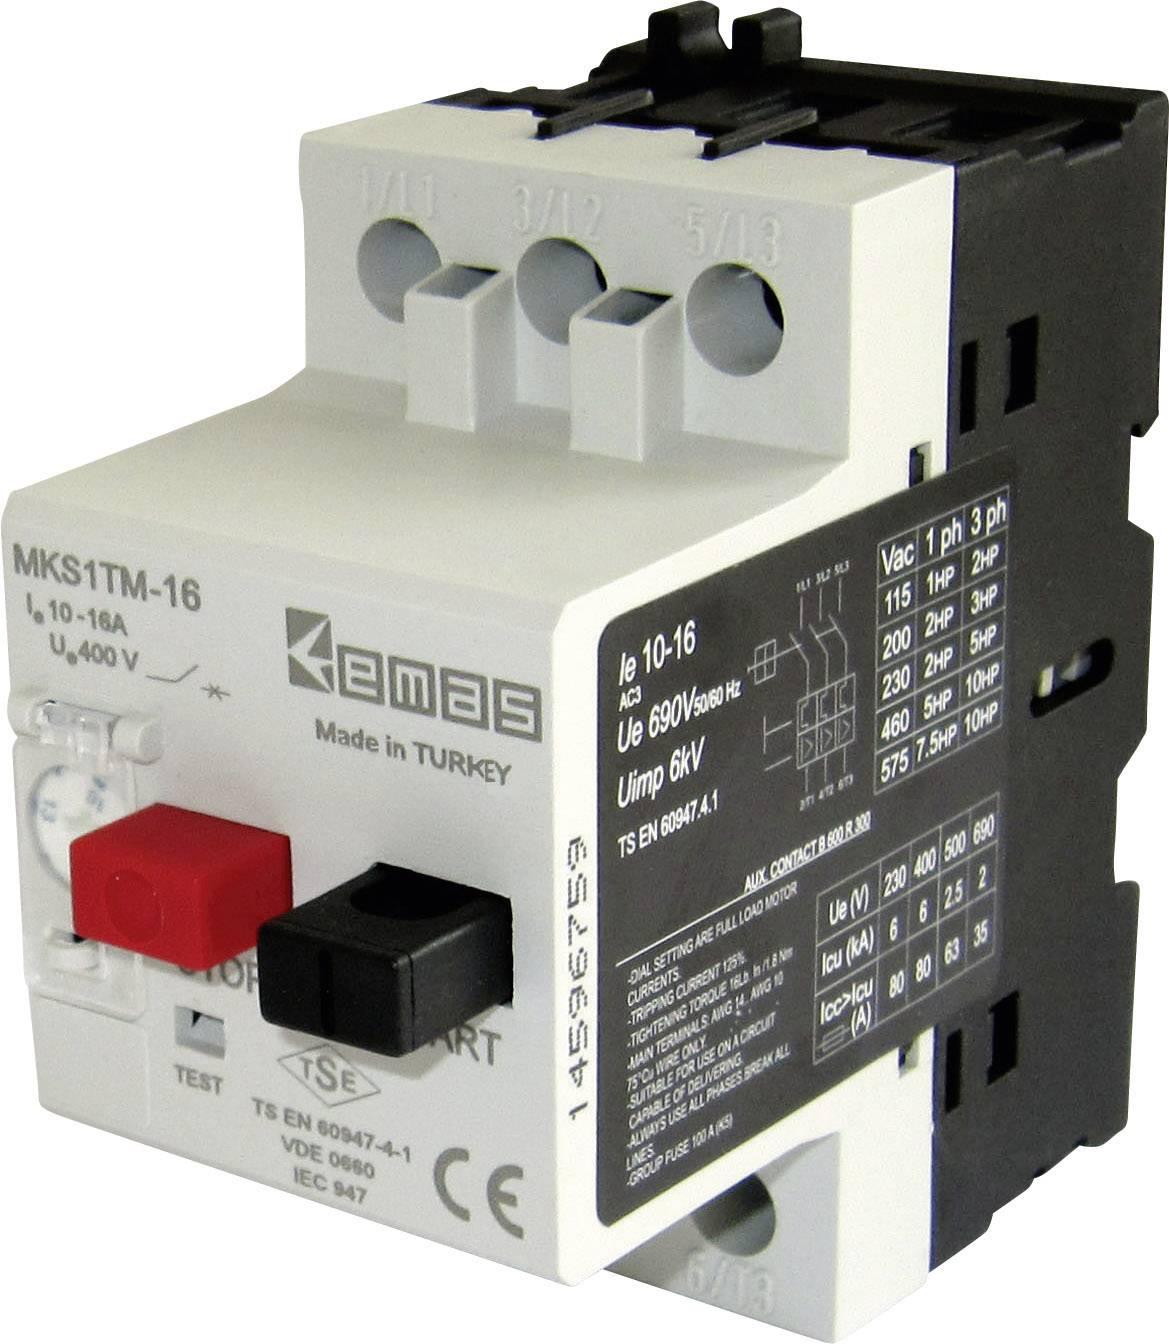 Ochranný spínač motora EMAS MKS1TM-16 MKS1TM-16, 400 V/AC, 16.0 A, 1 ks